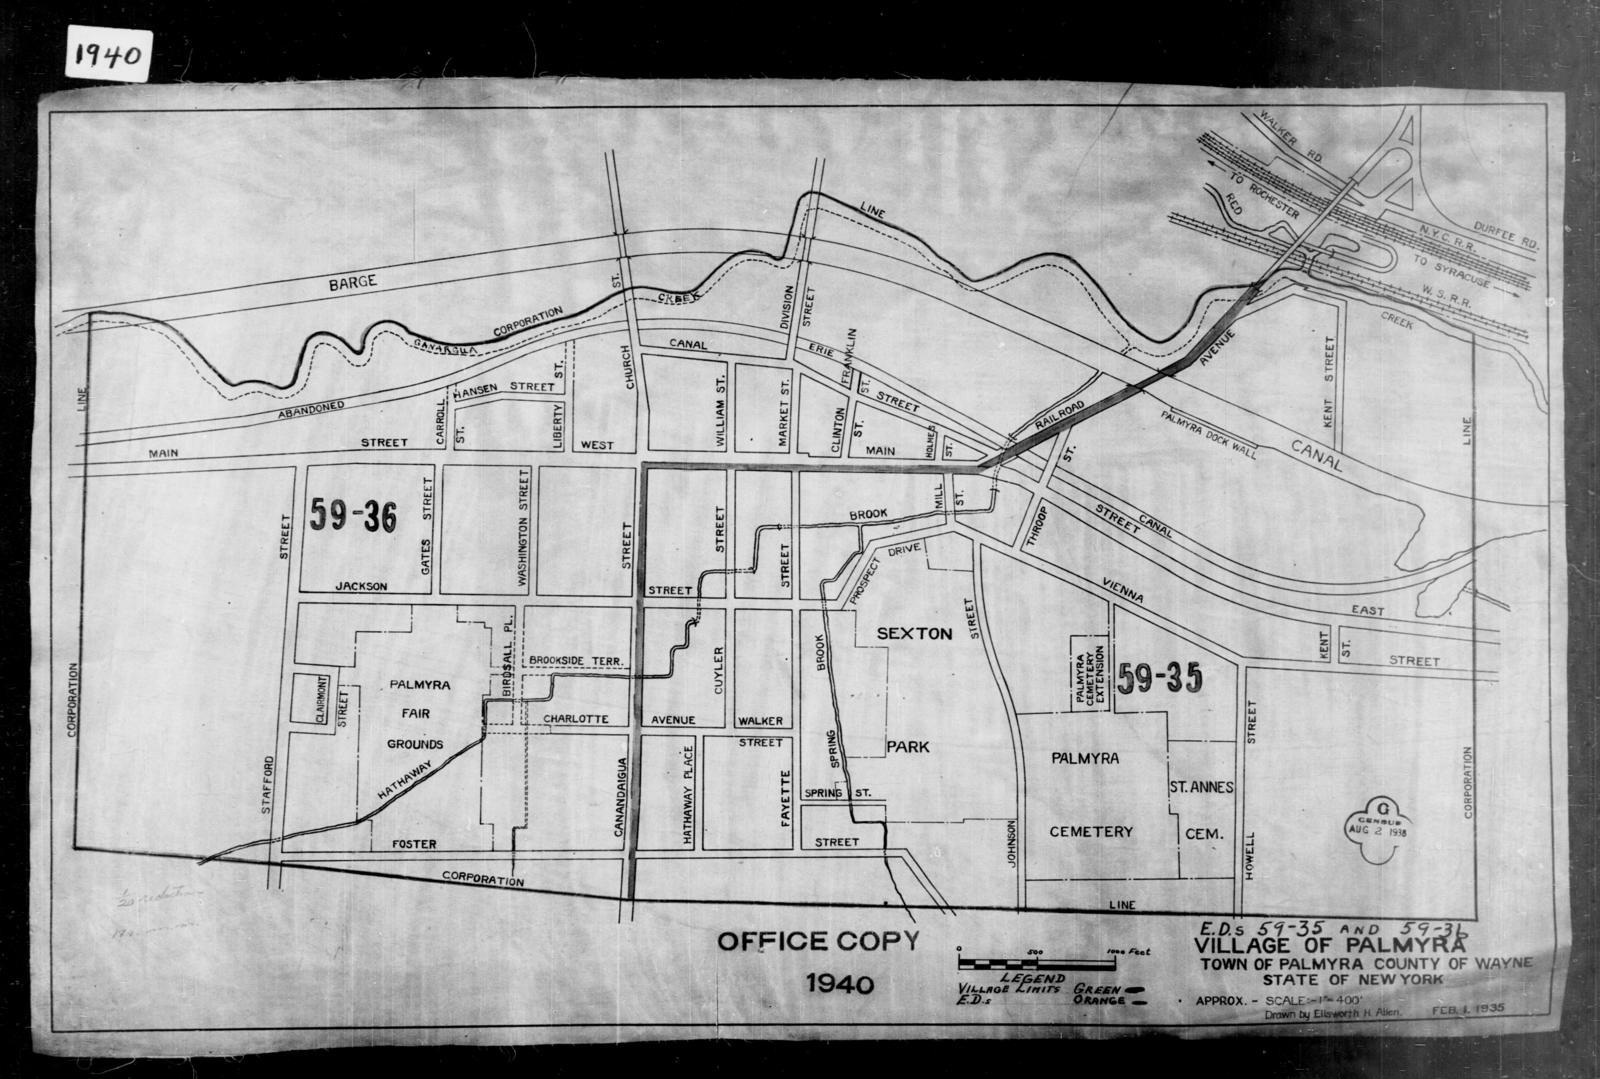 1940 Census Enumeration District Maps - New York - Wayne County - Palmyra - ED 59-35, ED 59-36, ED 59-37, ED 59-38